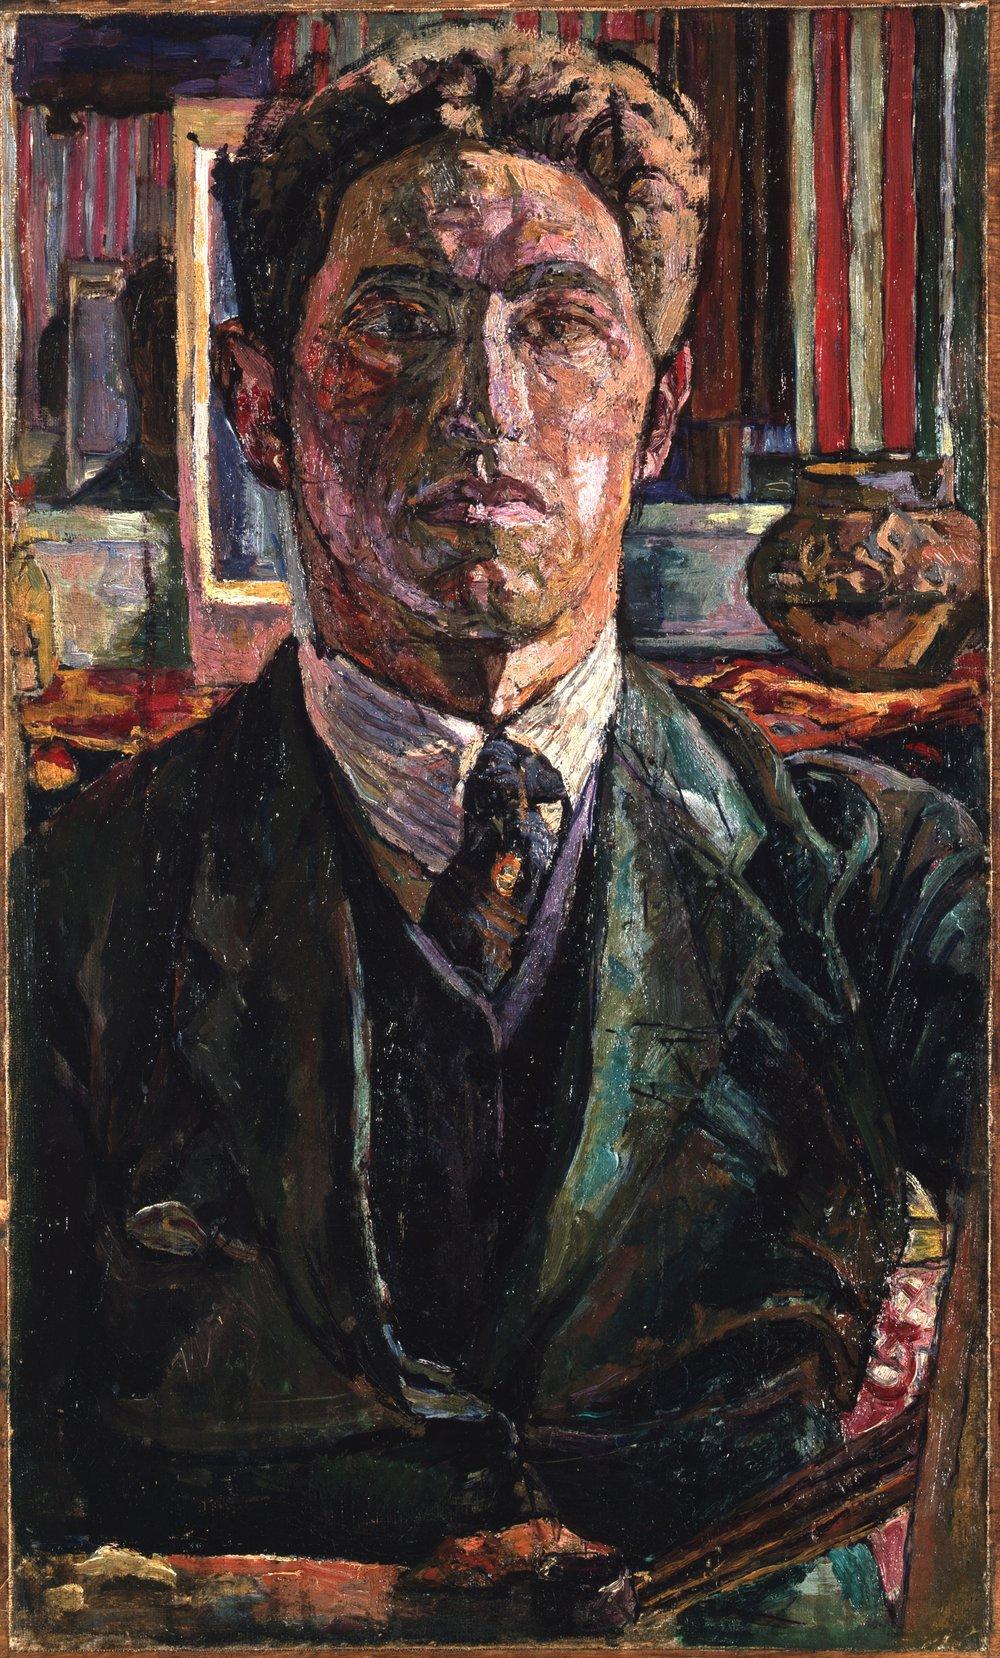 Alberto Giacometti.Self-portrait (1923) Kunsthaus Zurich - Alberto Giacometti Stiftung. Courtesy: Alberto Giacometti © Giacometti Estate (Fondation Giacometti + ADAGP)